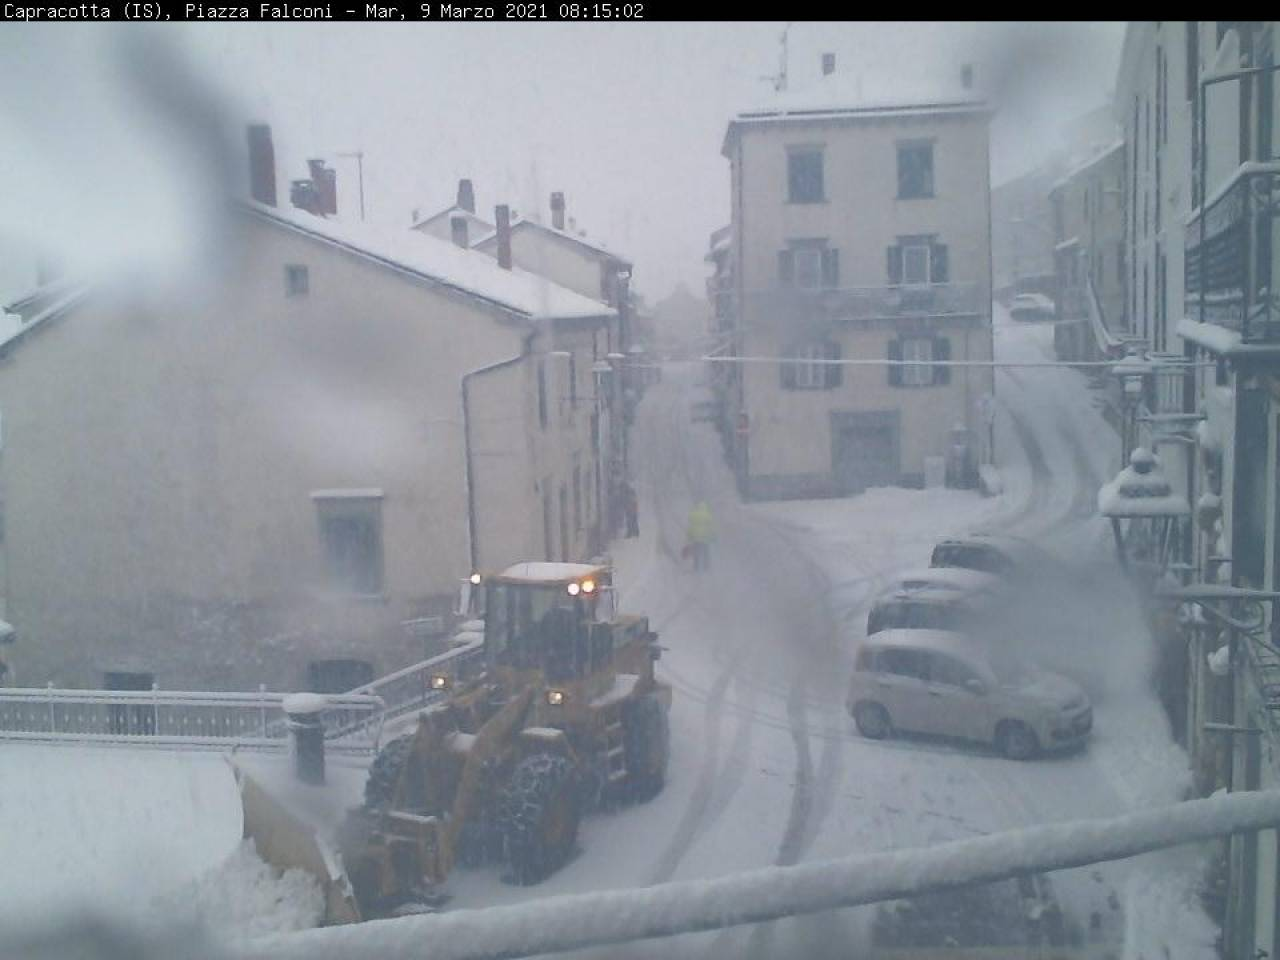 Neve a Capracotta, Molise